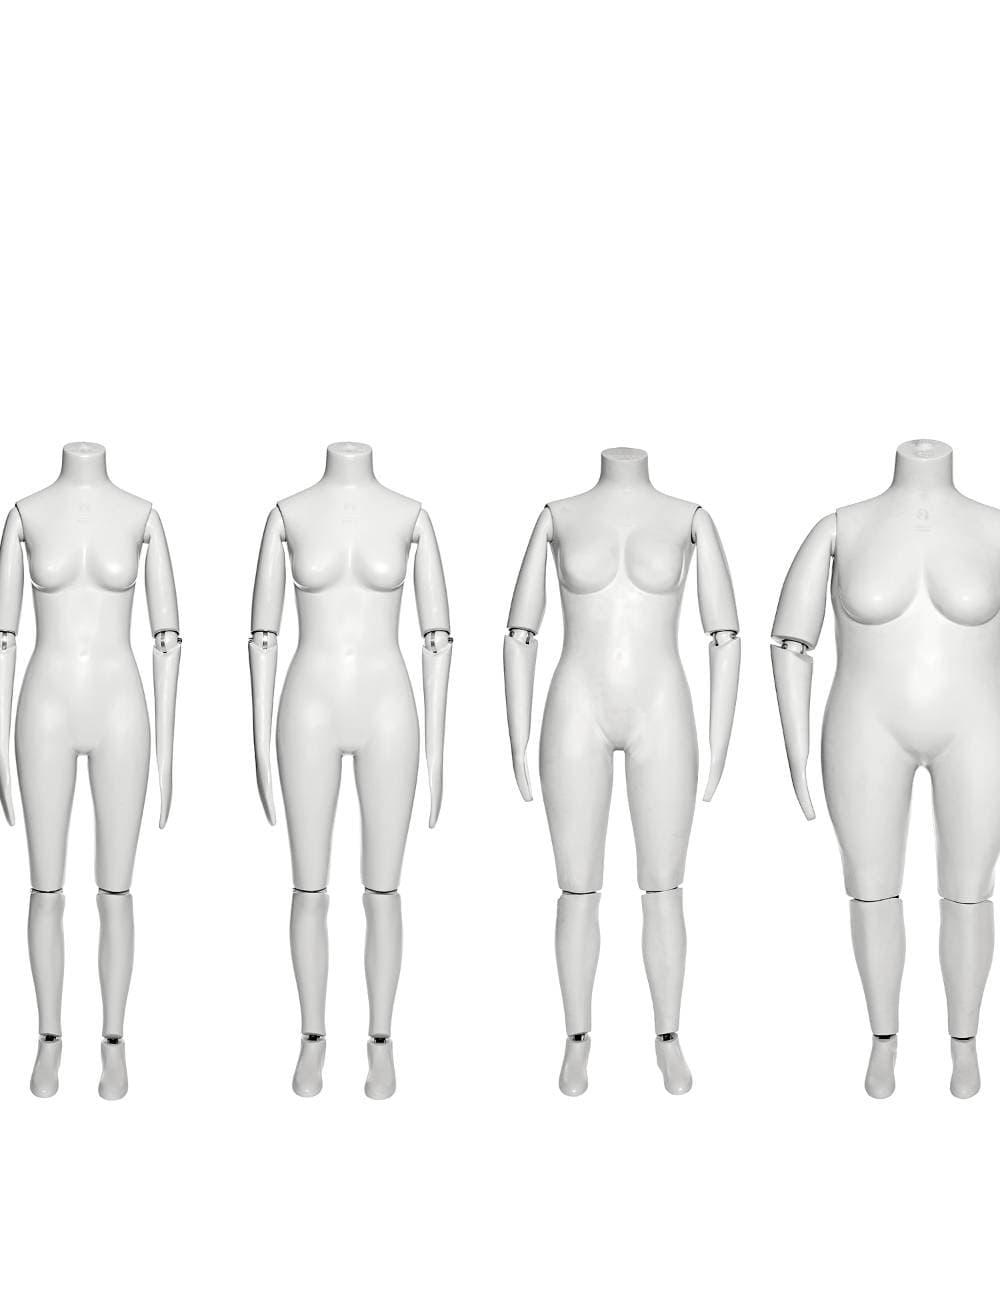 12 body shapes